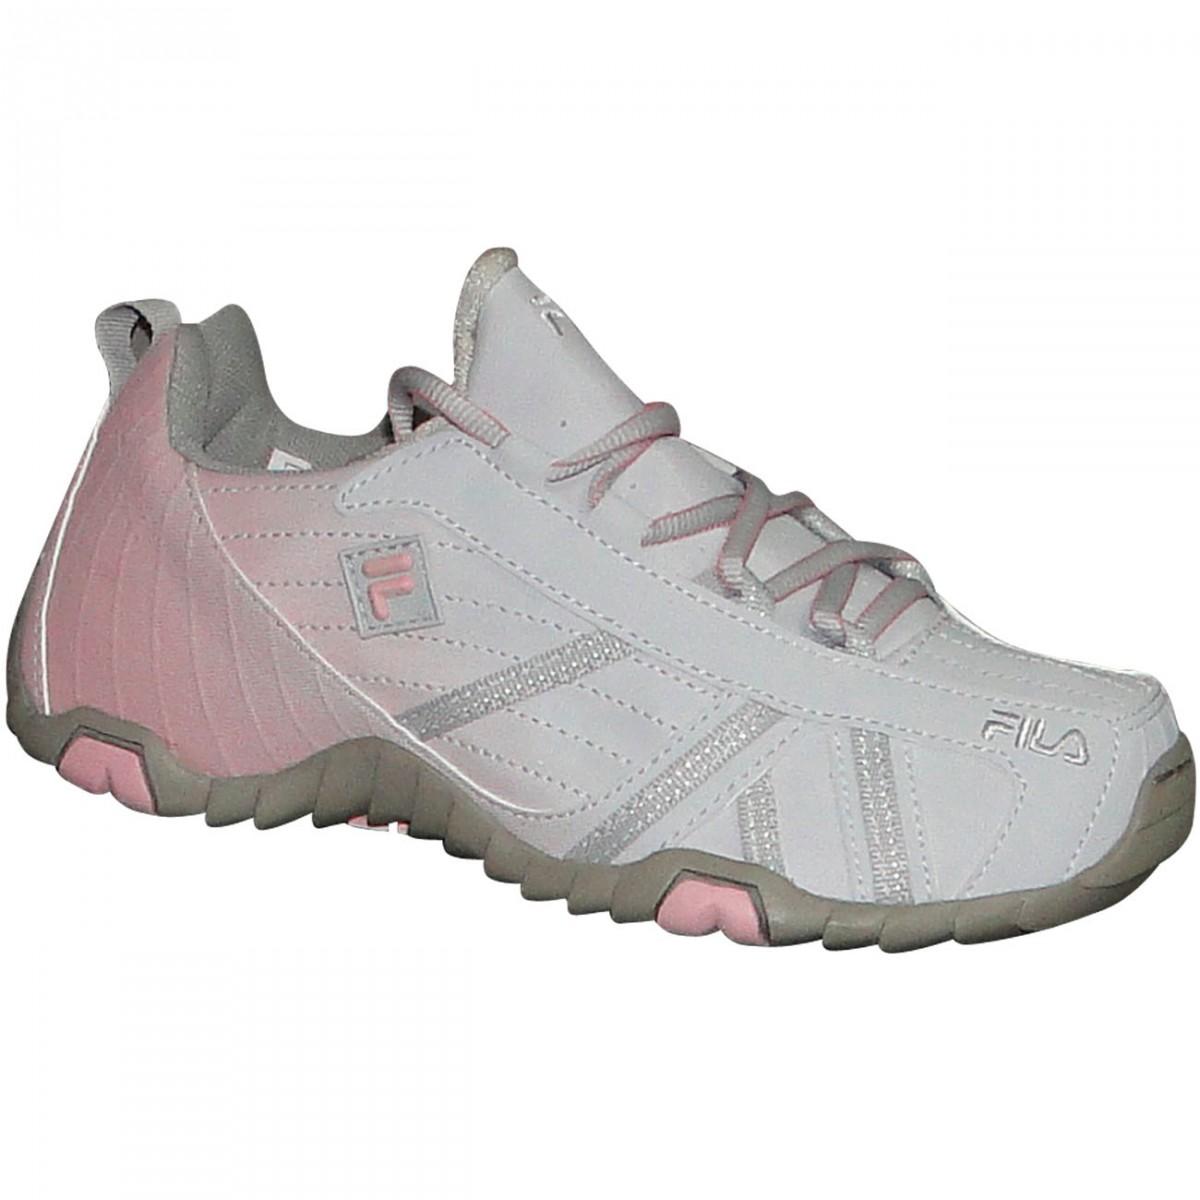 3ba8964808 Tenis Fila Slant Summer 51O140X-495 - Ice Rose - Chuteira Nike ...